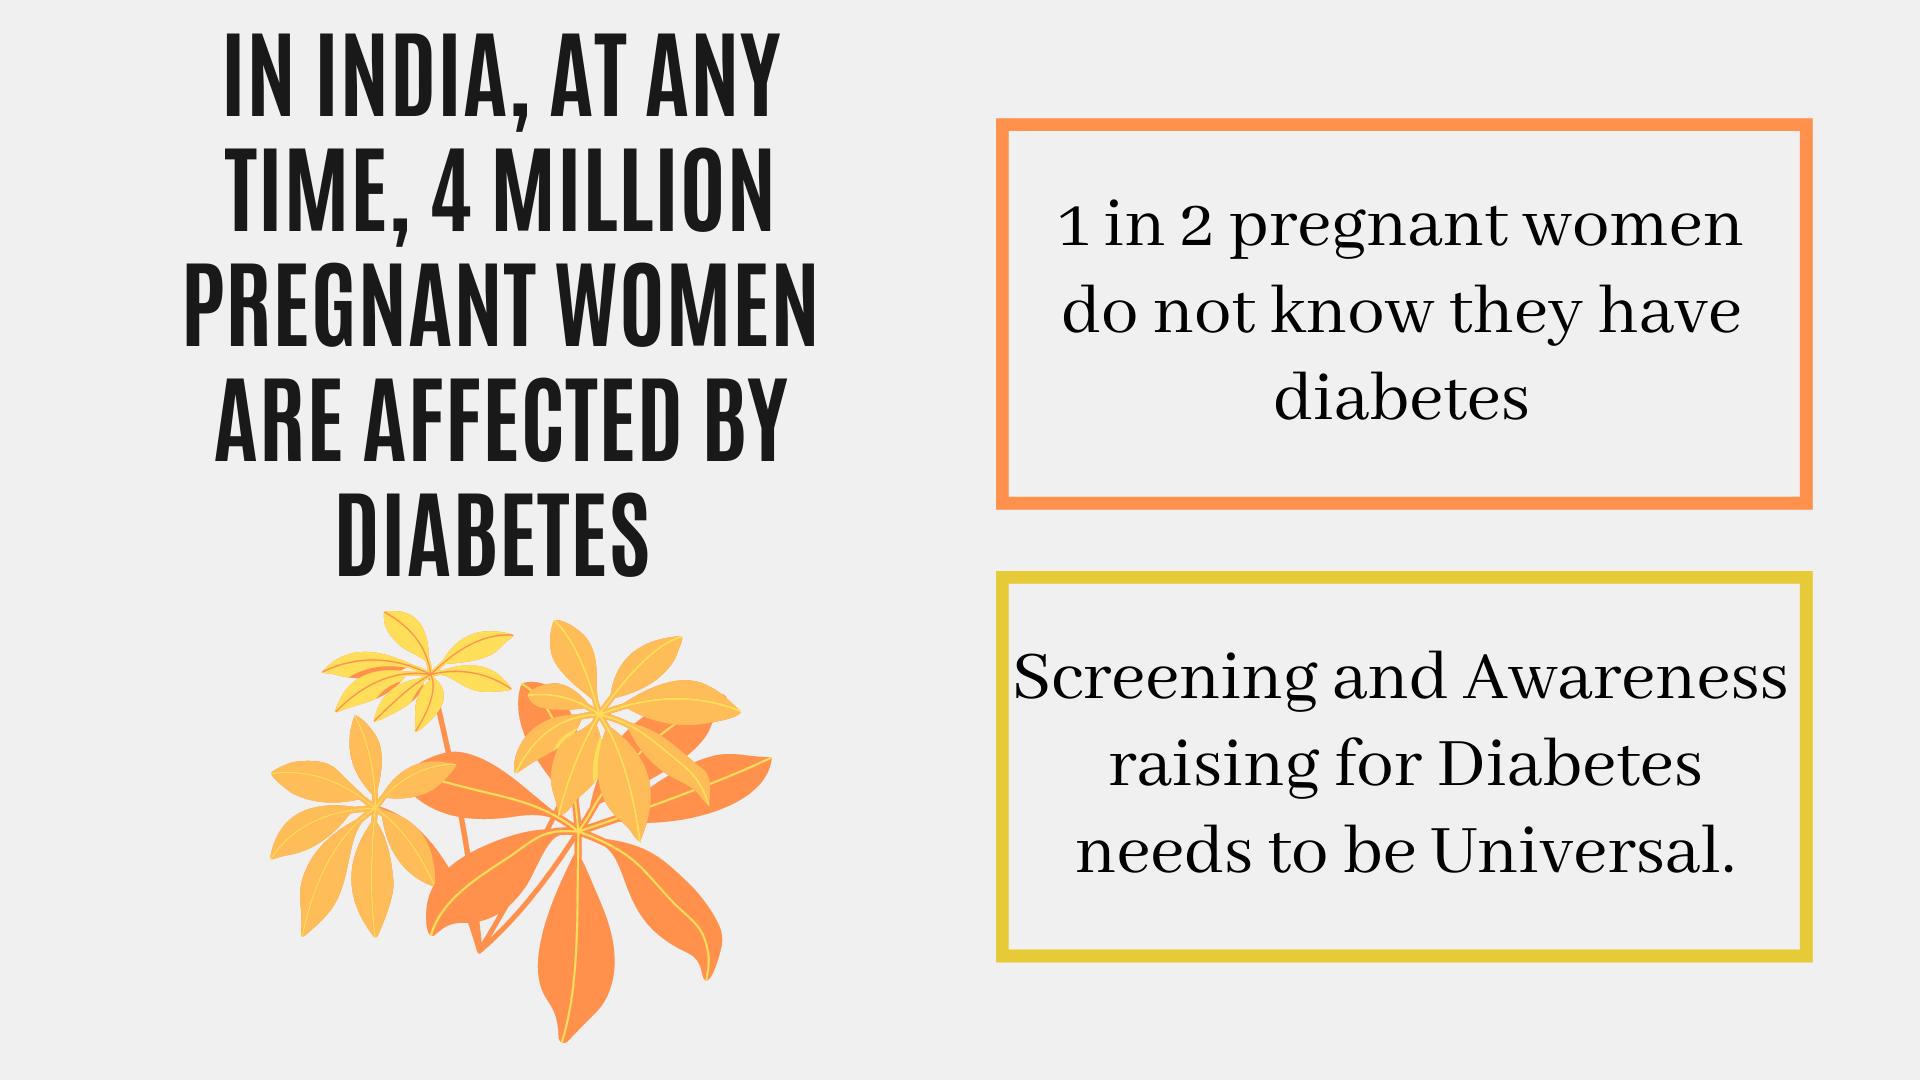 Gestational diabetes awareness raising India